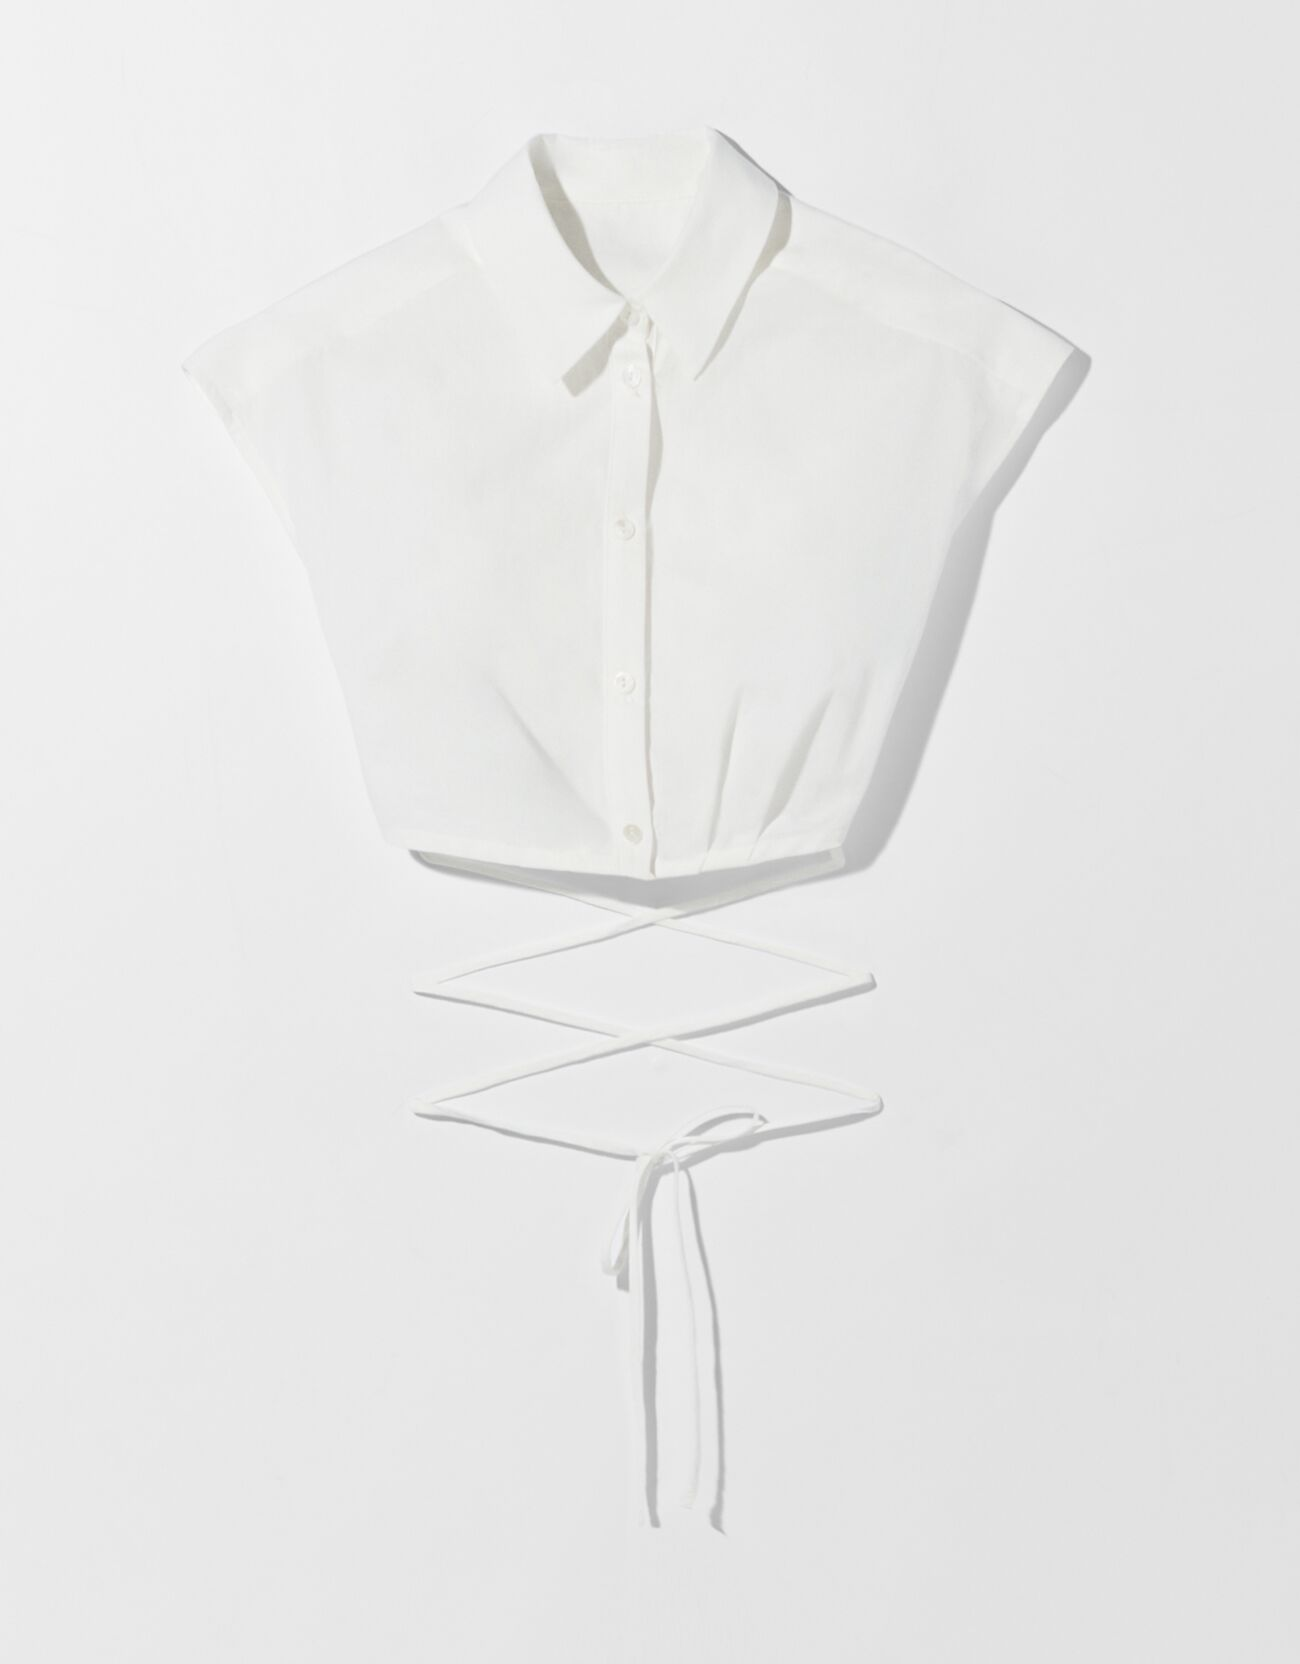 Camisa sin mangas popelín cropped lazada.